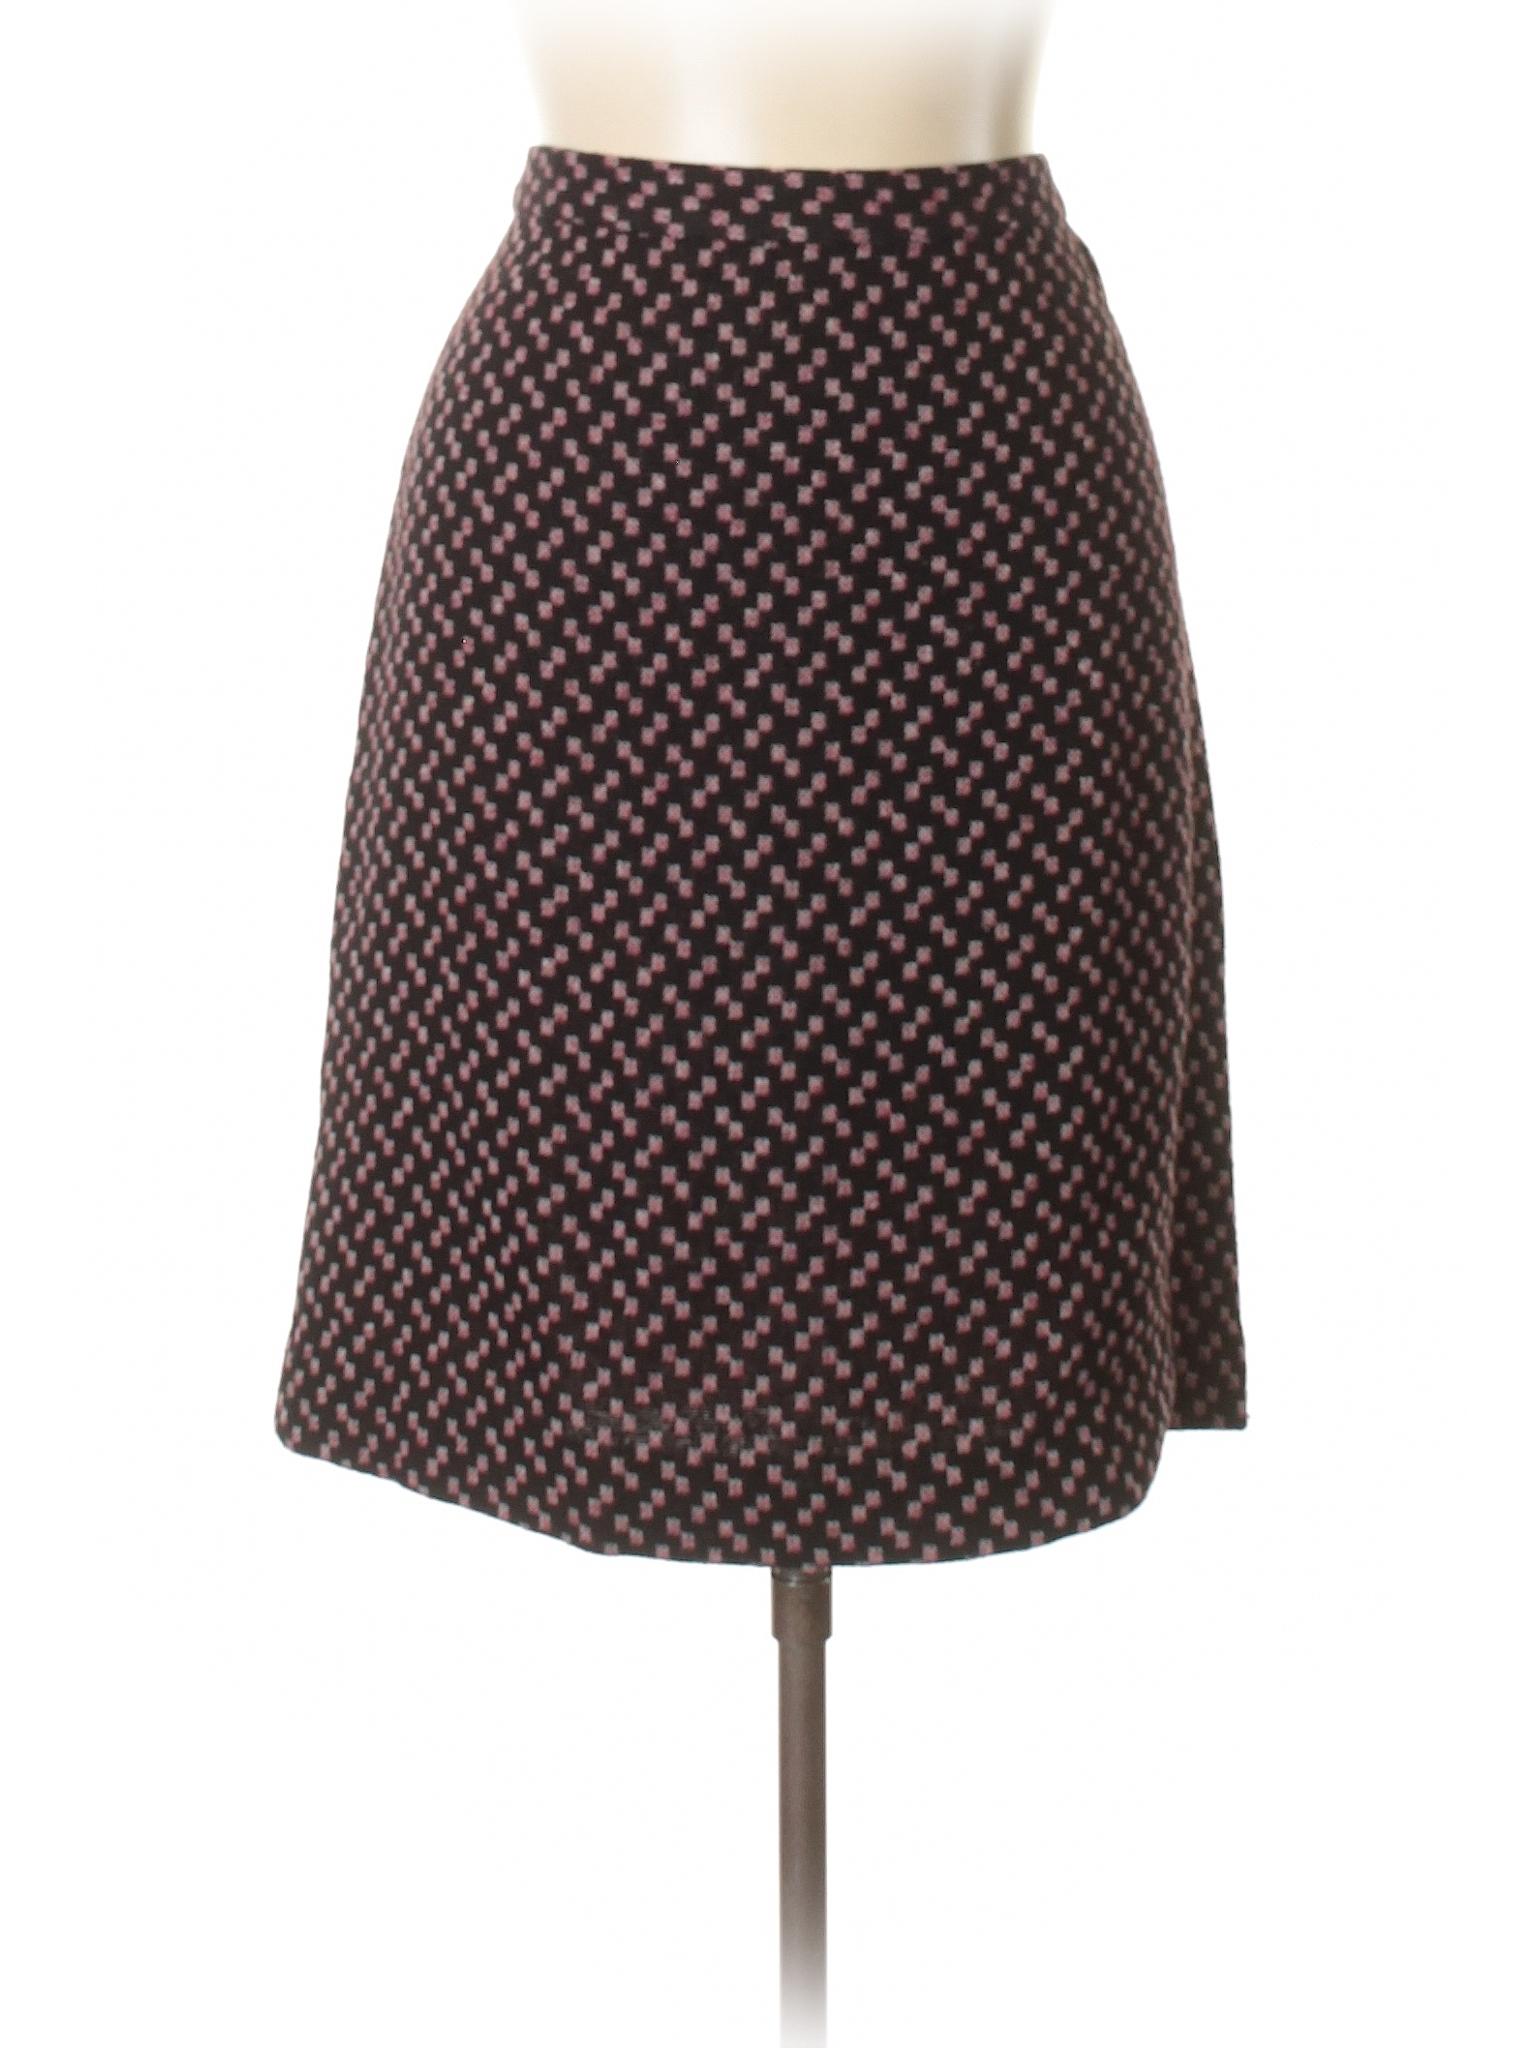 winter Casual Navy Old Skirt Leisure w7WapqFZ